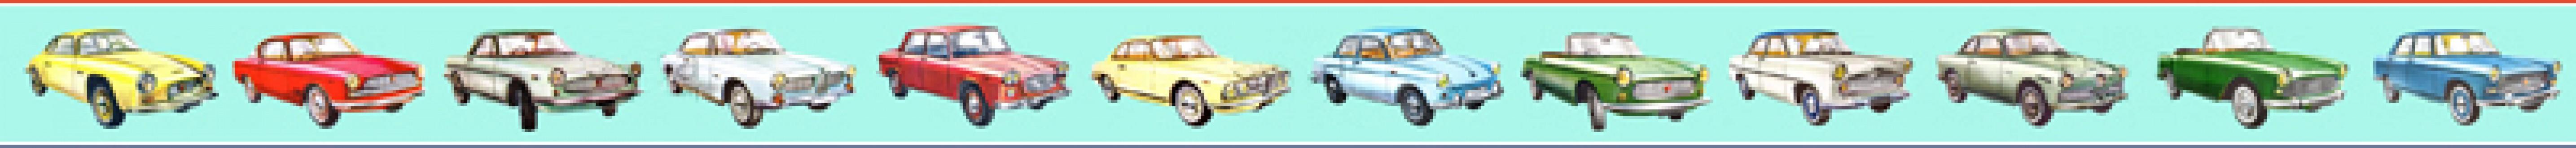 Cenefa Vintage Cars 105158711